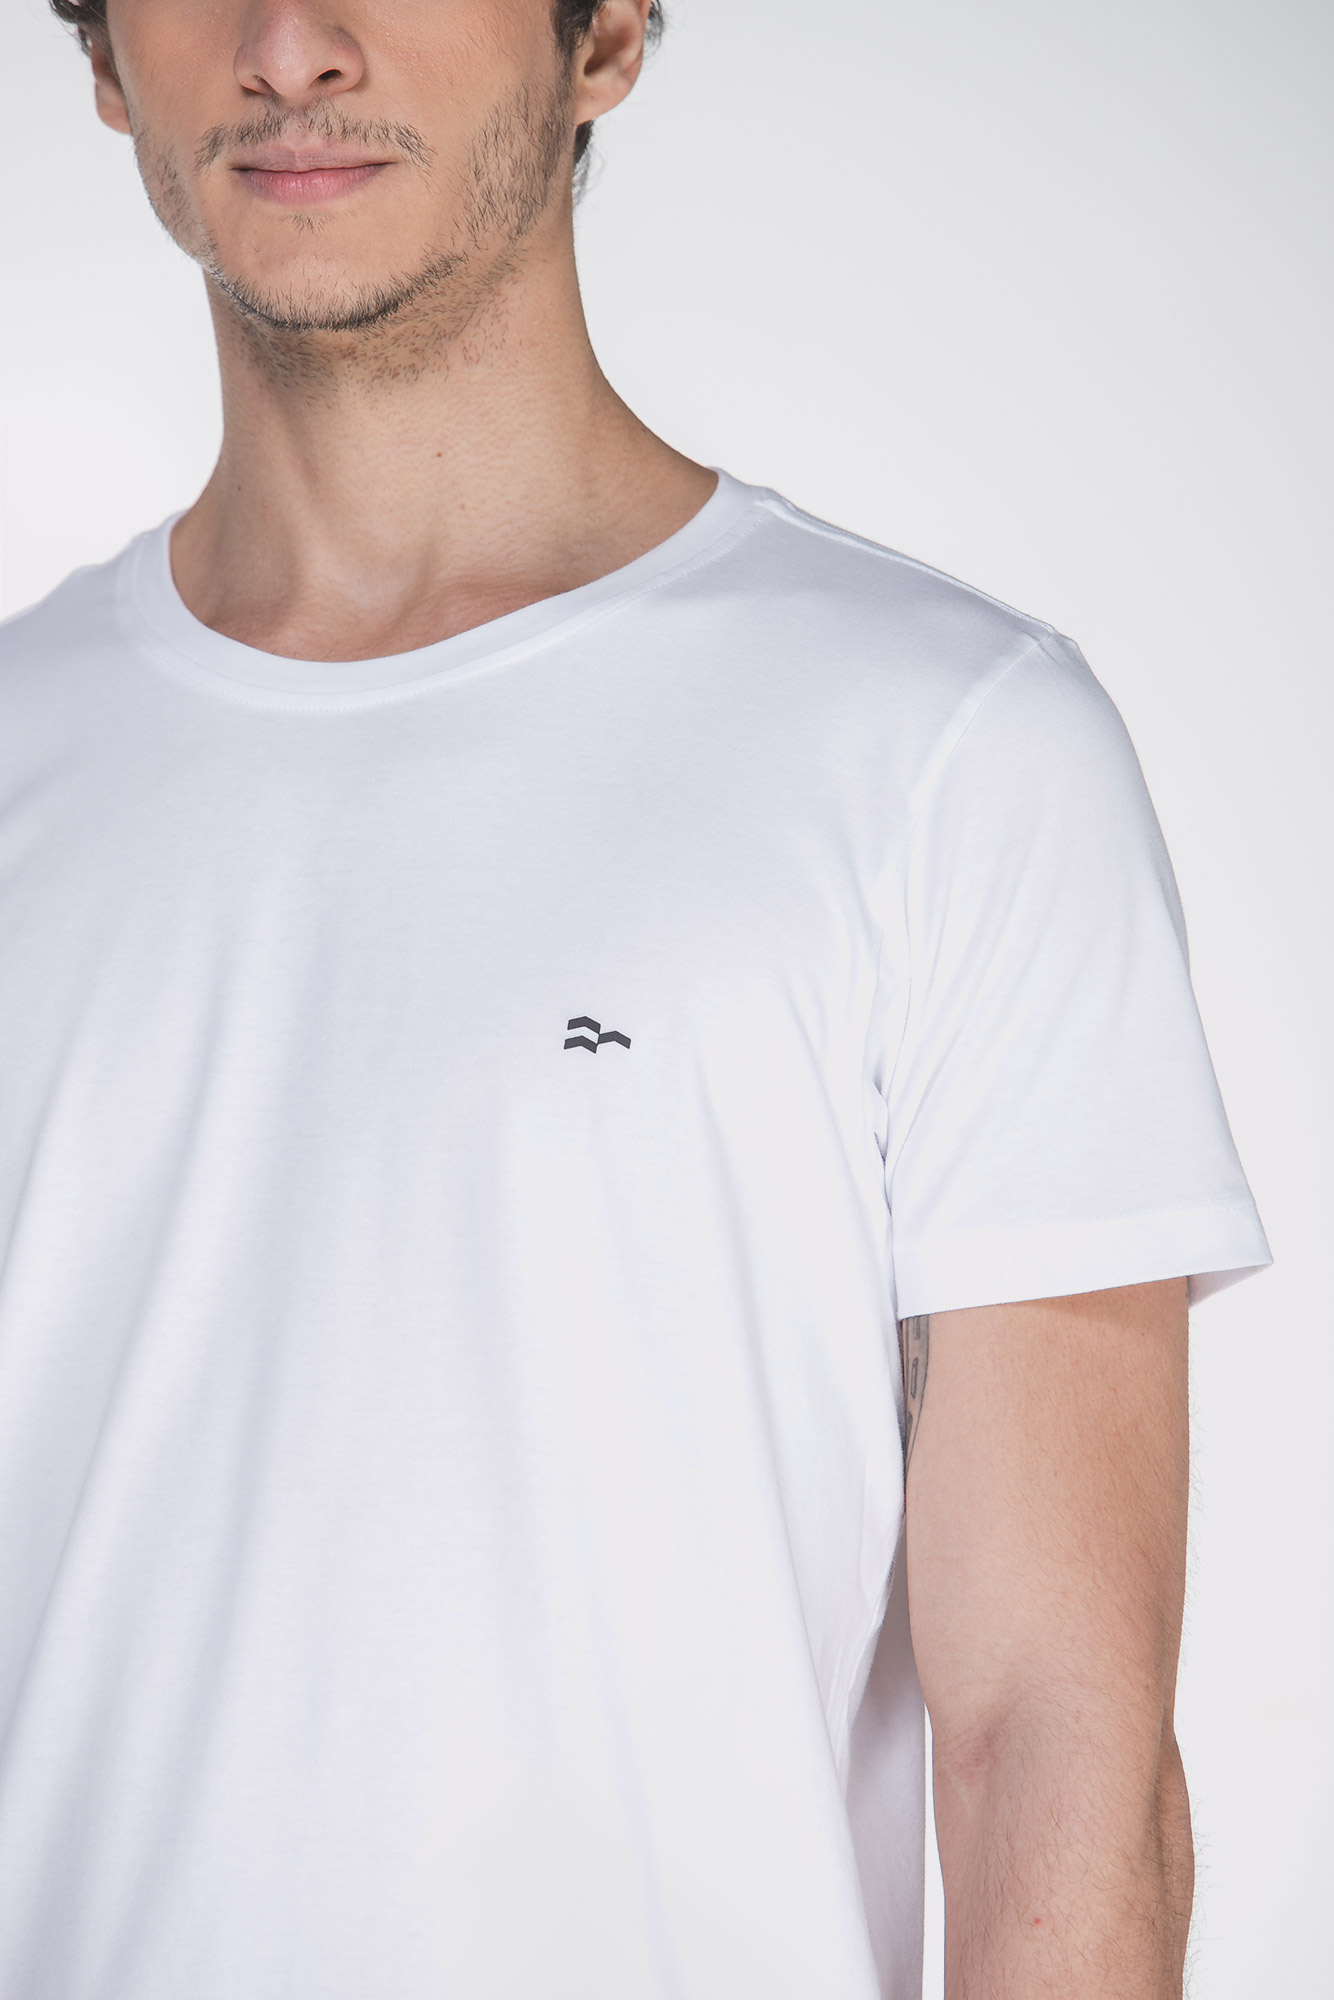 Camiseta Basic Egypt Branco/Preto